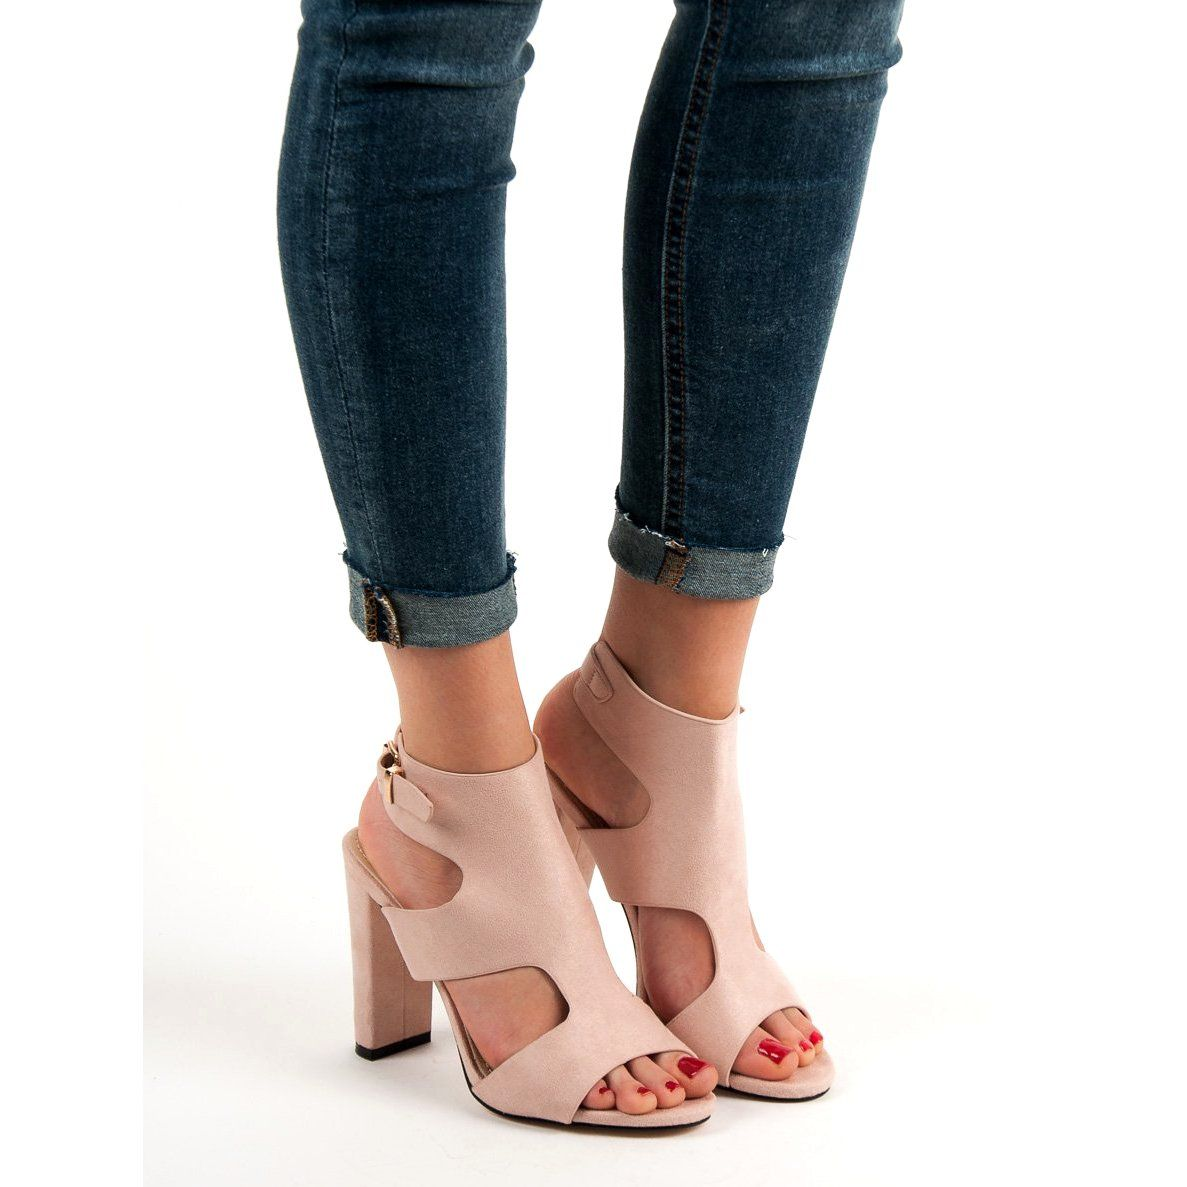 77d3576eddba11 #Sandały #Damskie #IdealShoes #Ideal #Shoes #Brązowe #Seksowne #Sandałki